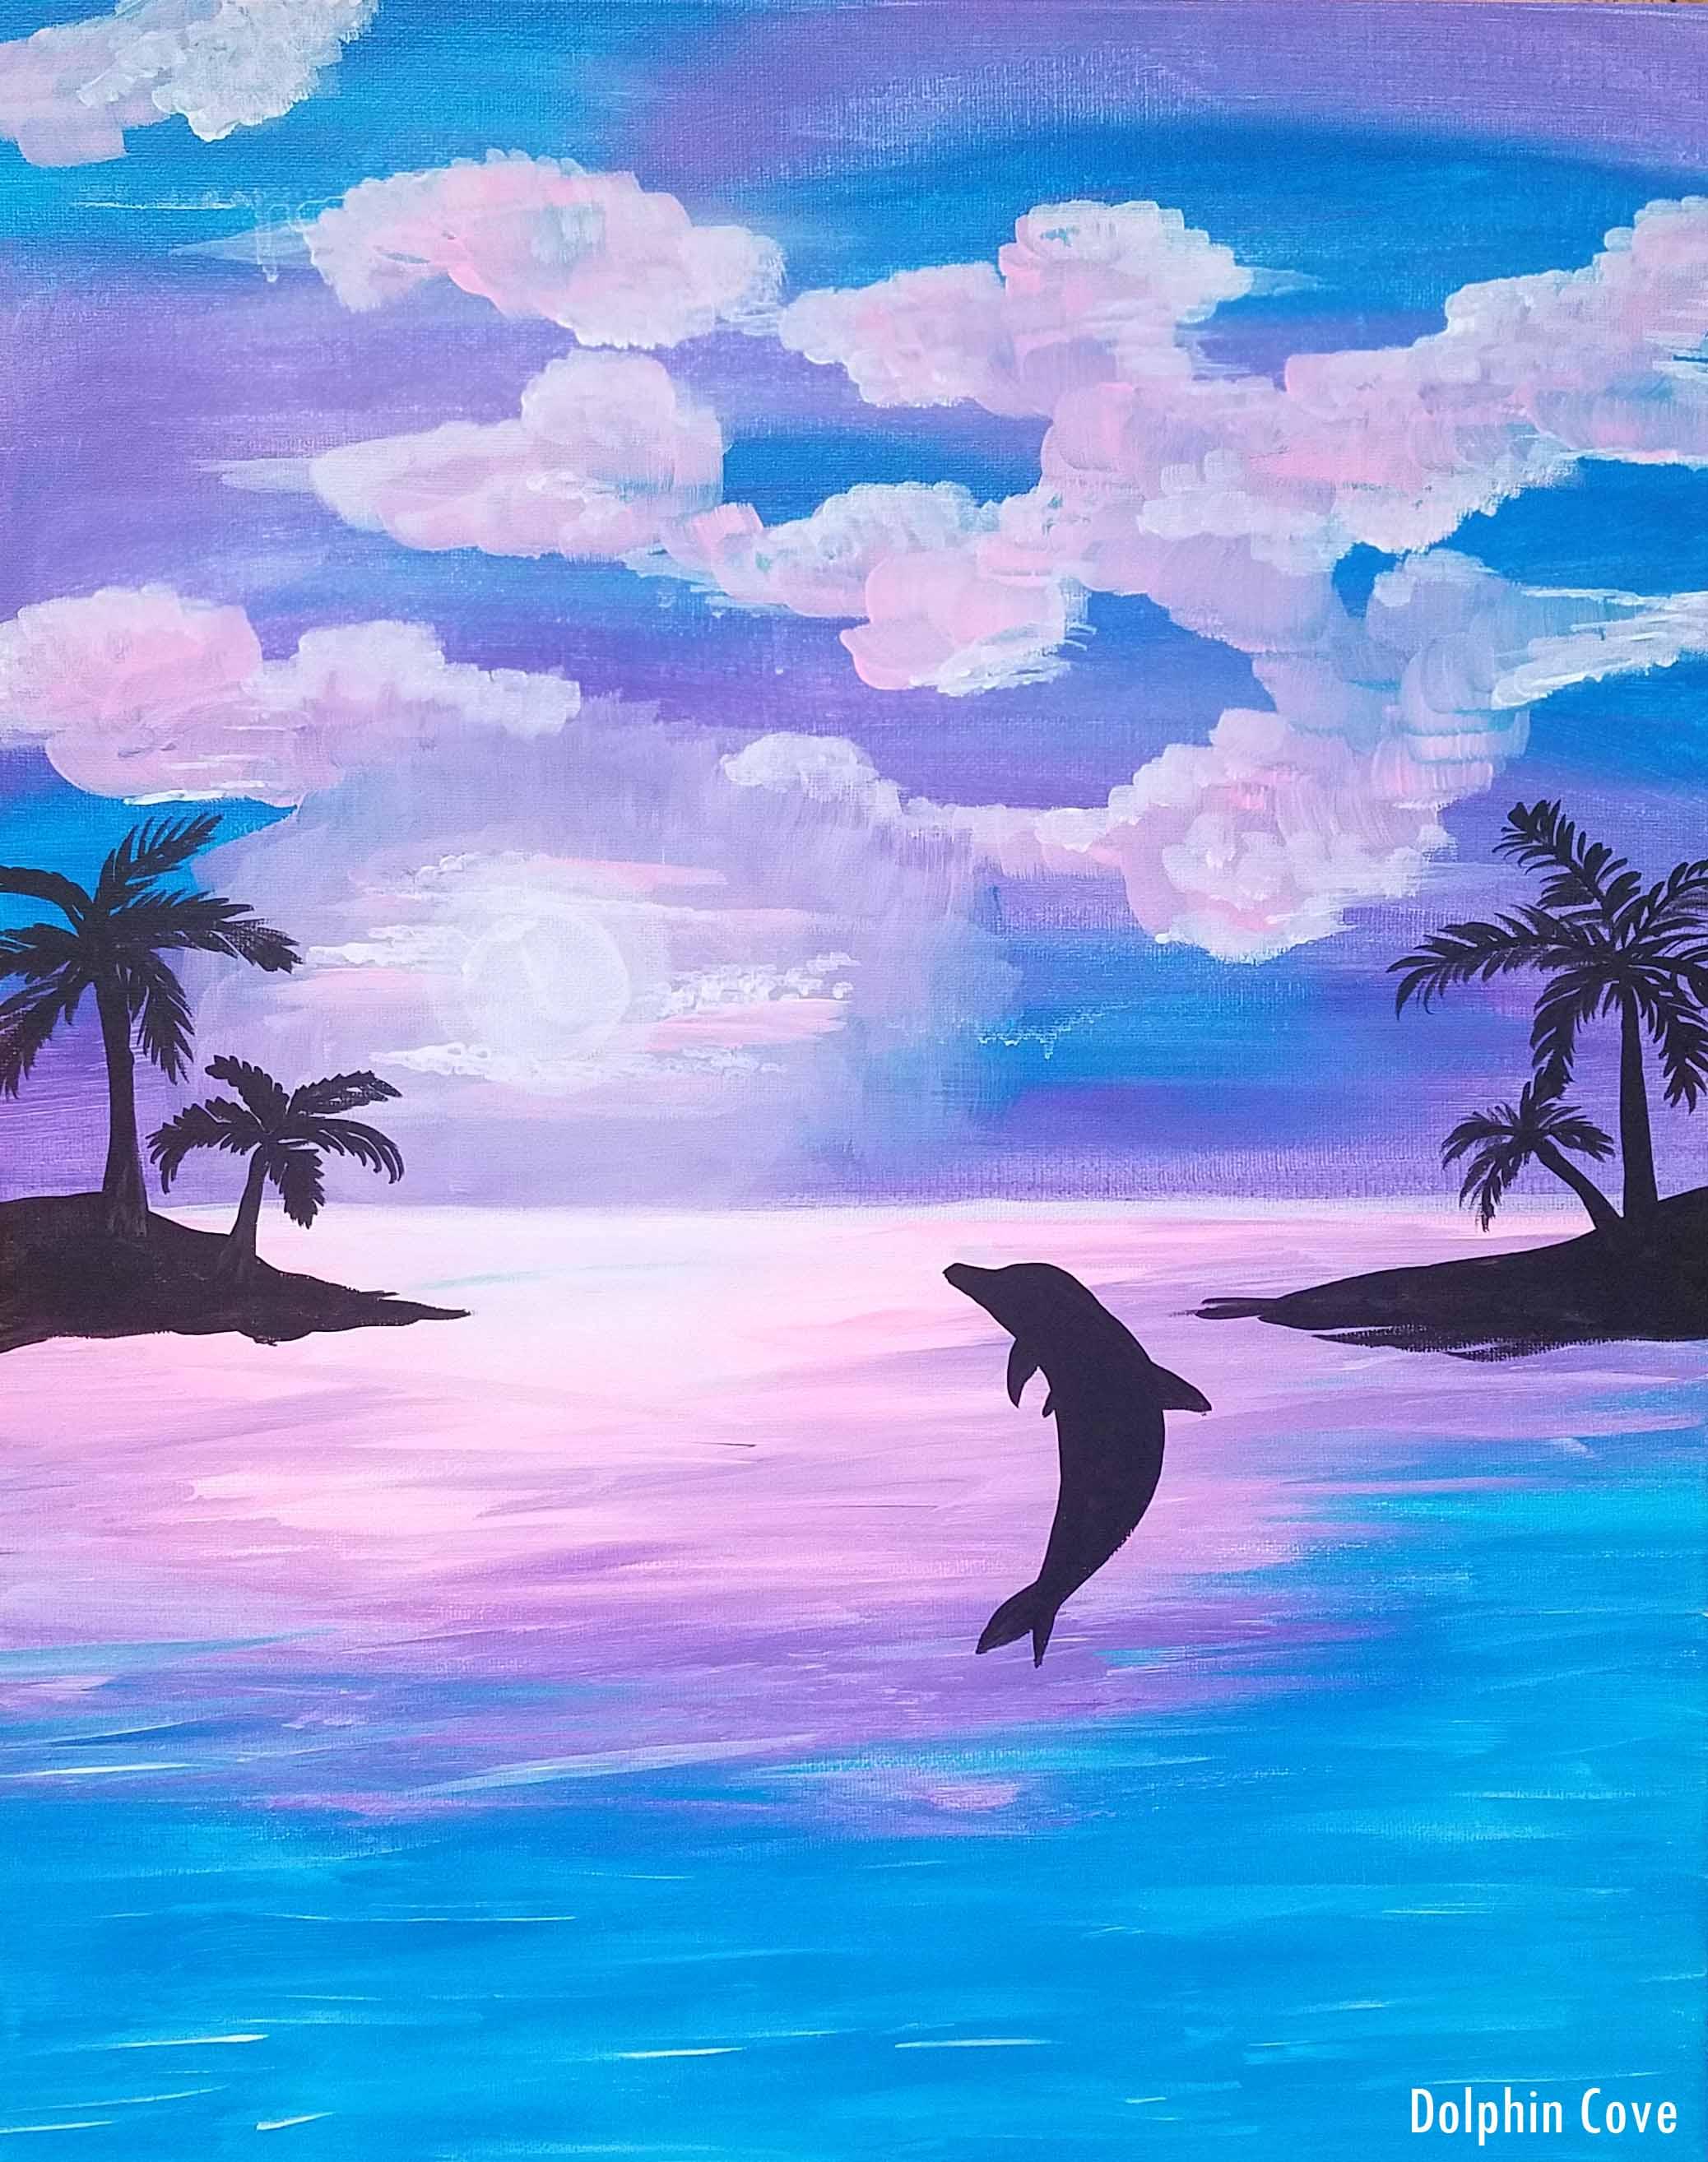 Dolphin Cove.jpg